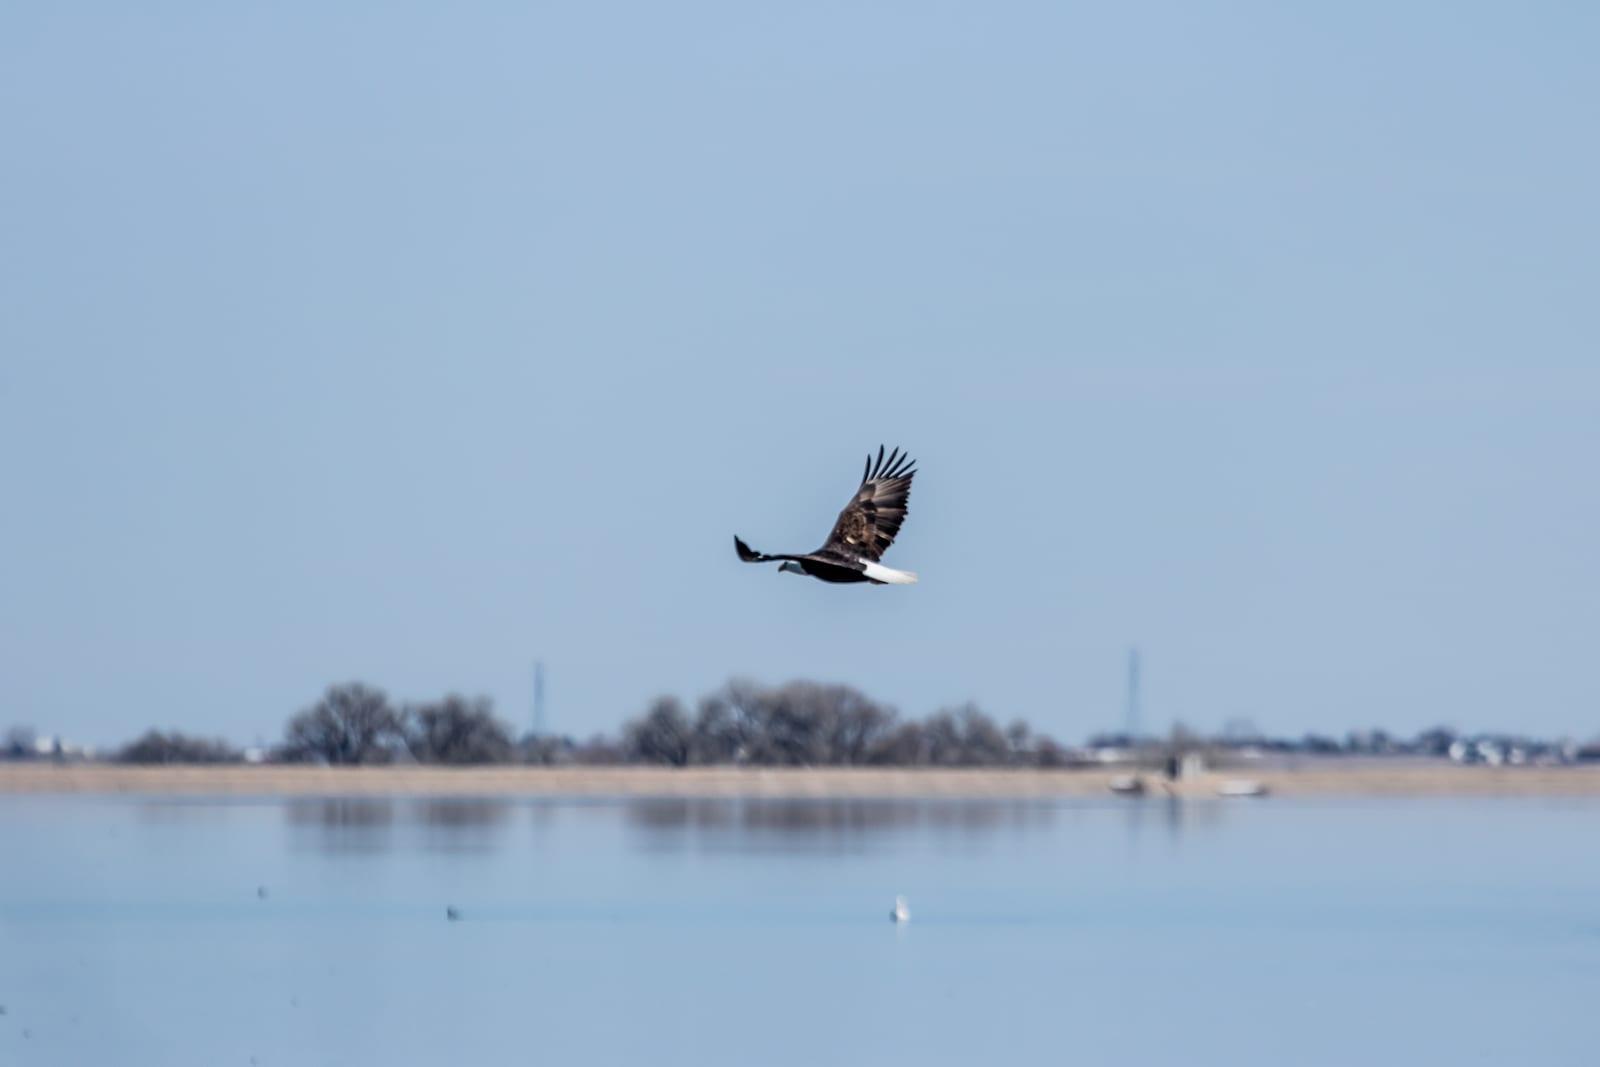 Barr Lake Bald Eagle Colorado